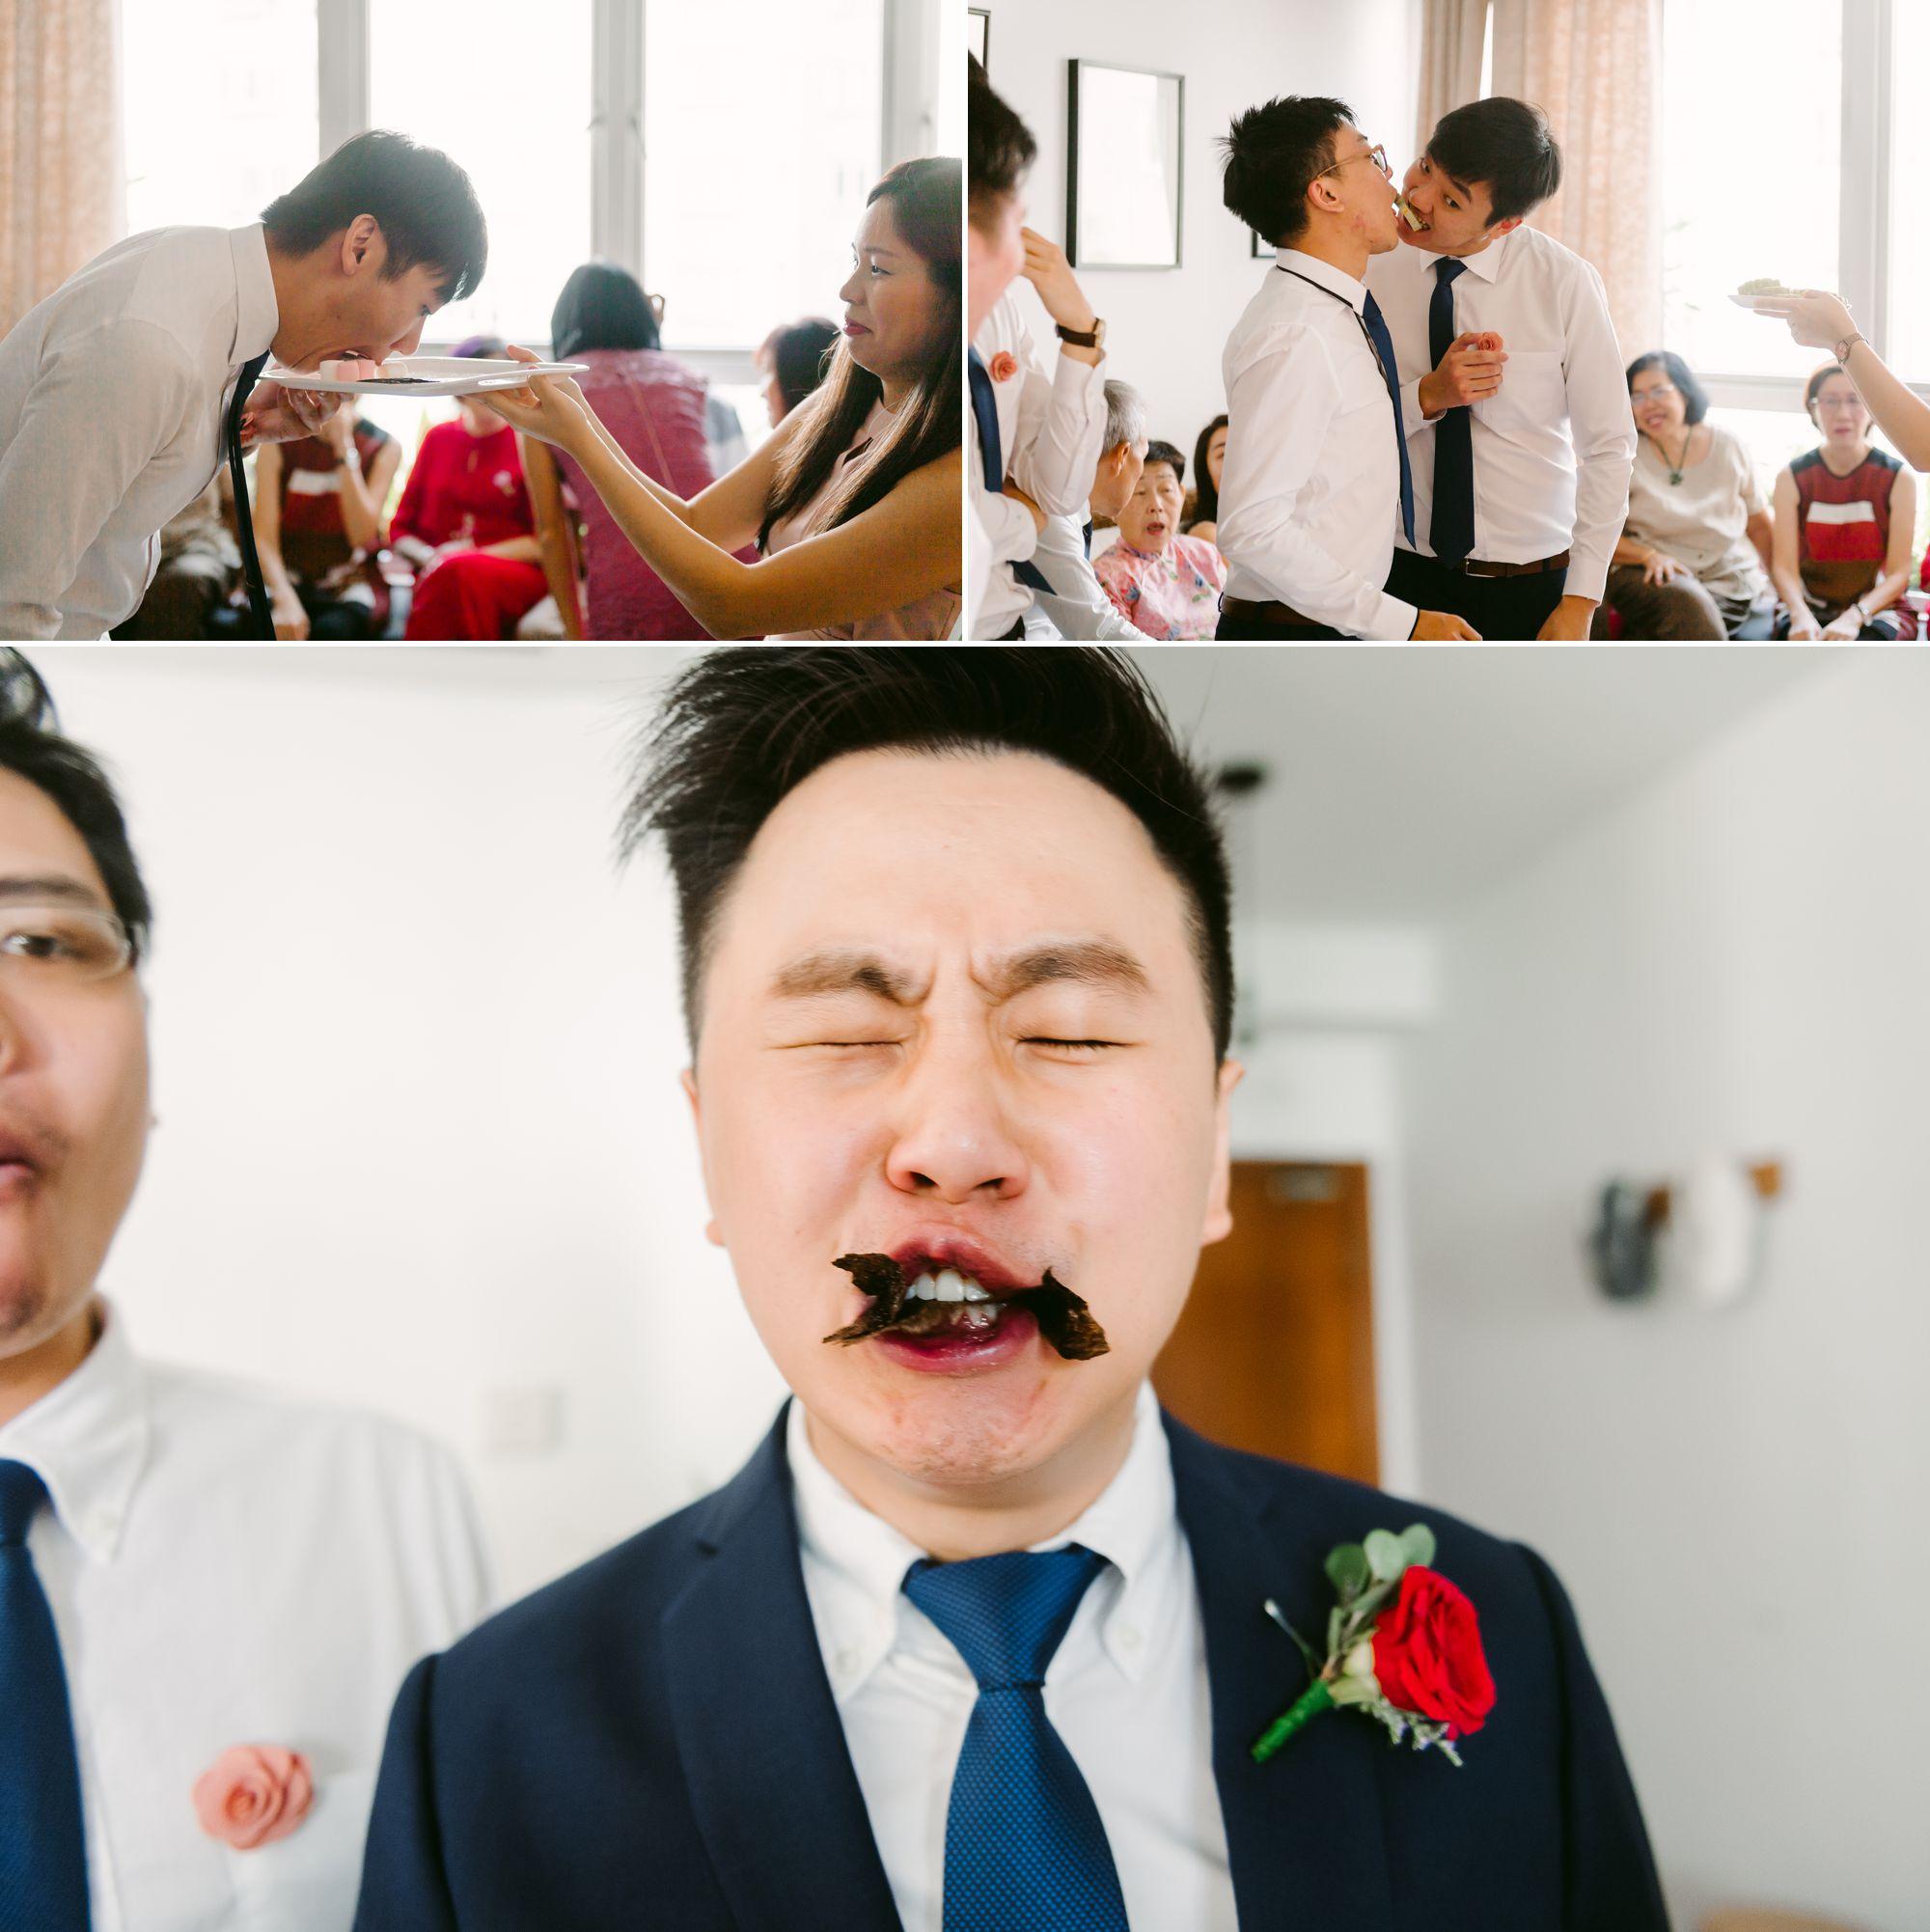 conrad_wedding_Singapore_ 12.jpg